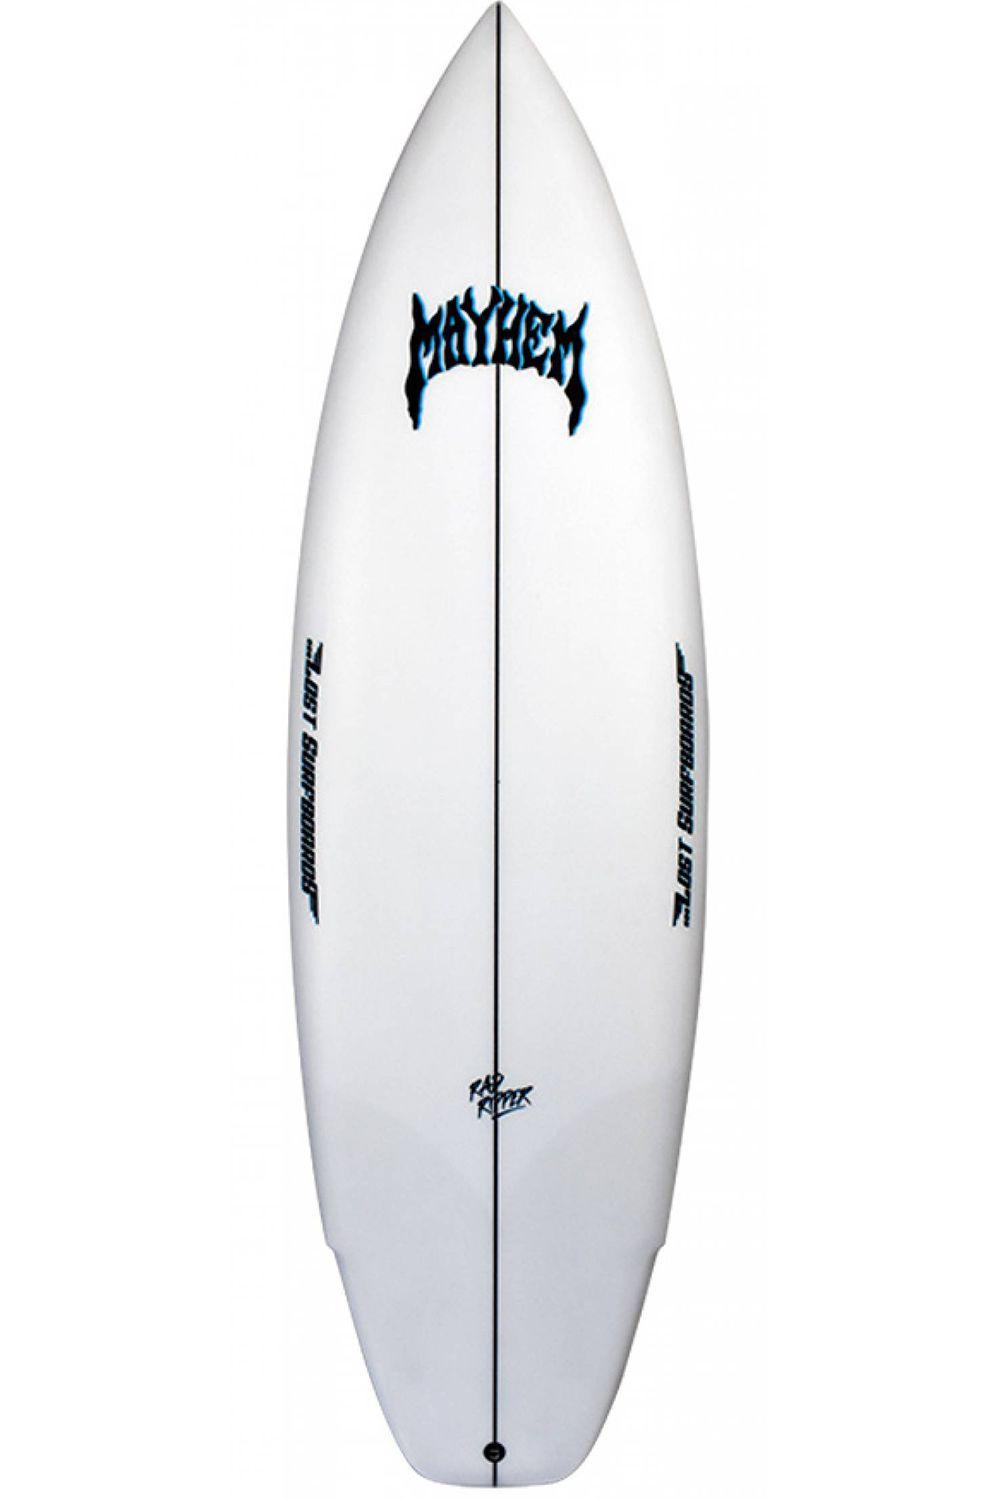 Lost Surf Board 5'9 RAD RIPPER Squash Tail - Color FCS II Multisystem 5ft9